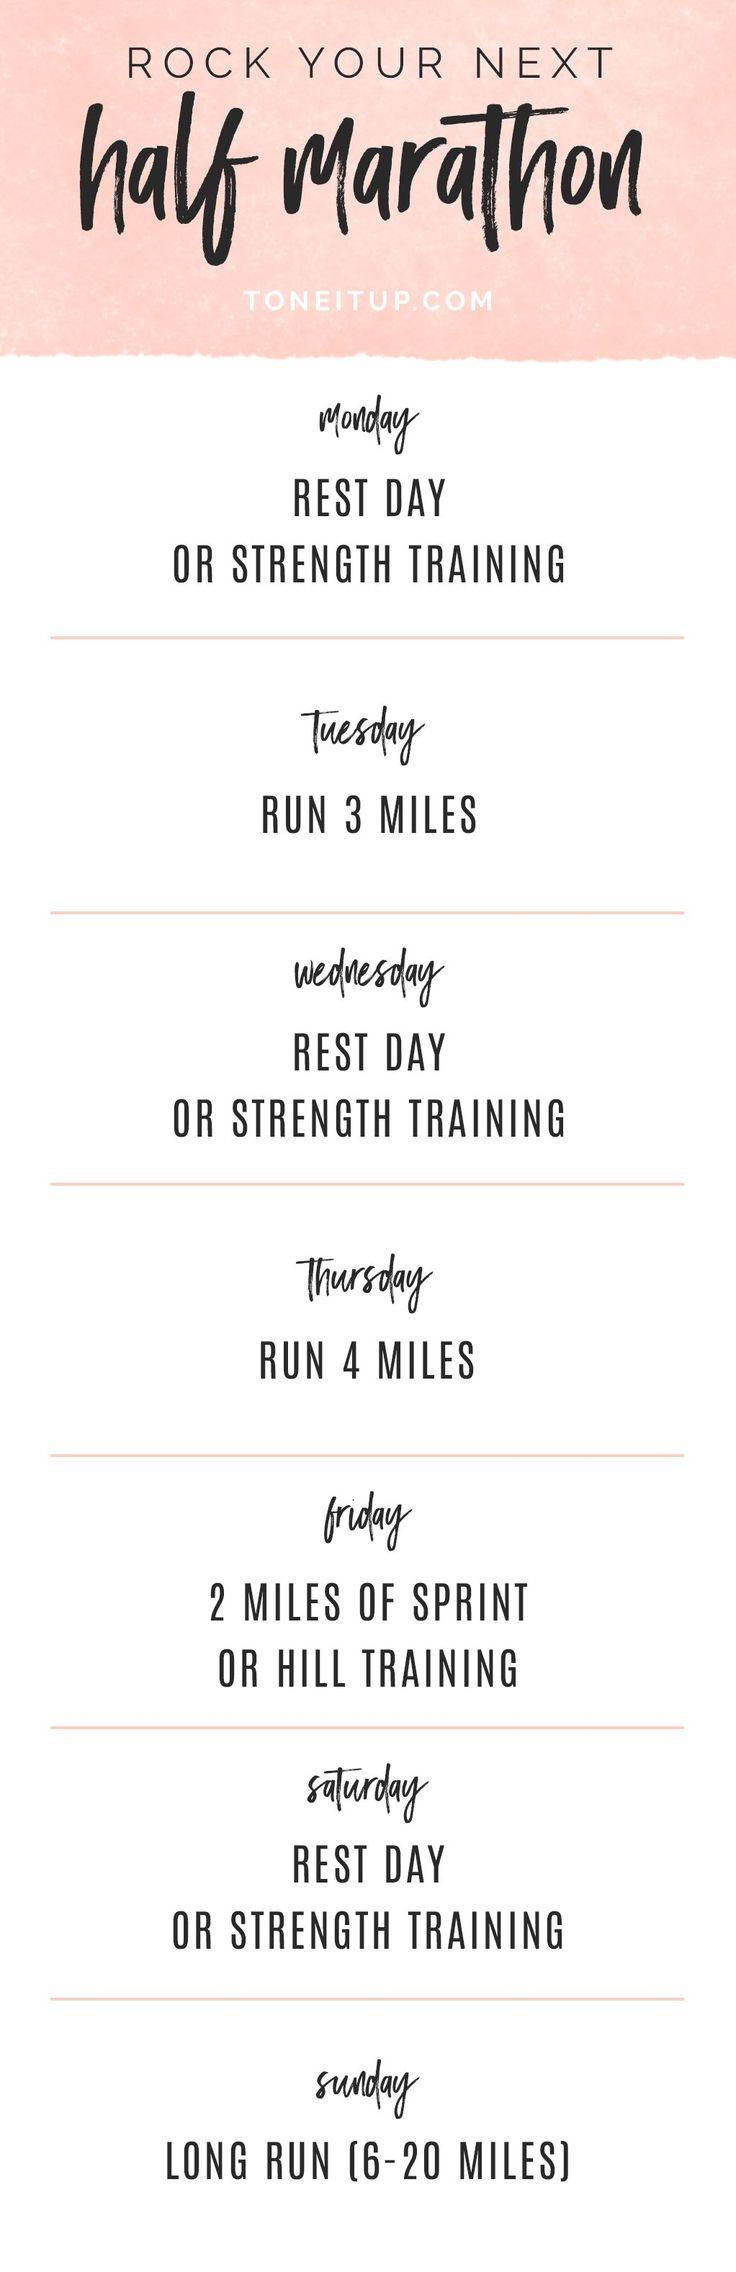 Rock your next Half Marathon or Marathon with our Training Tips!! Tone It Up!